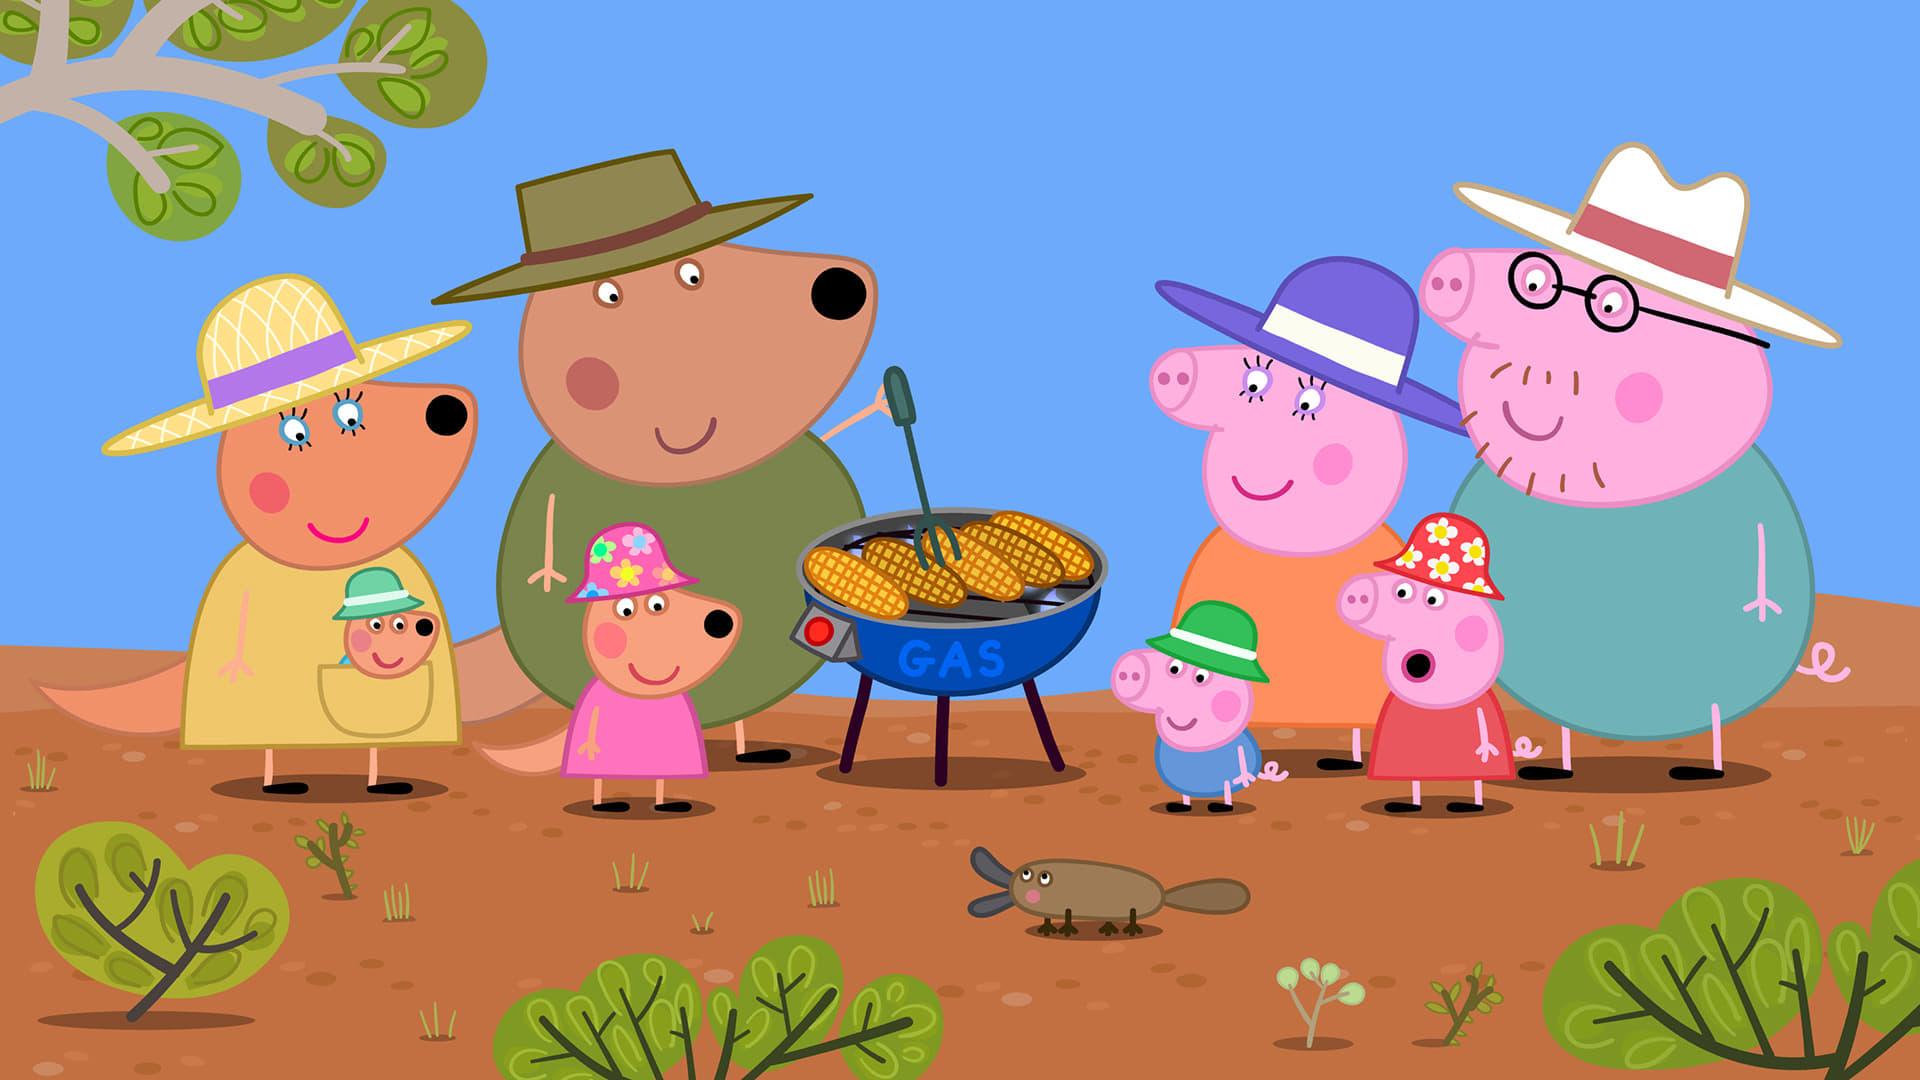 Peppa Pig Season 5 :Episode 19  Australia Part 1 - The Outback